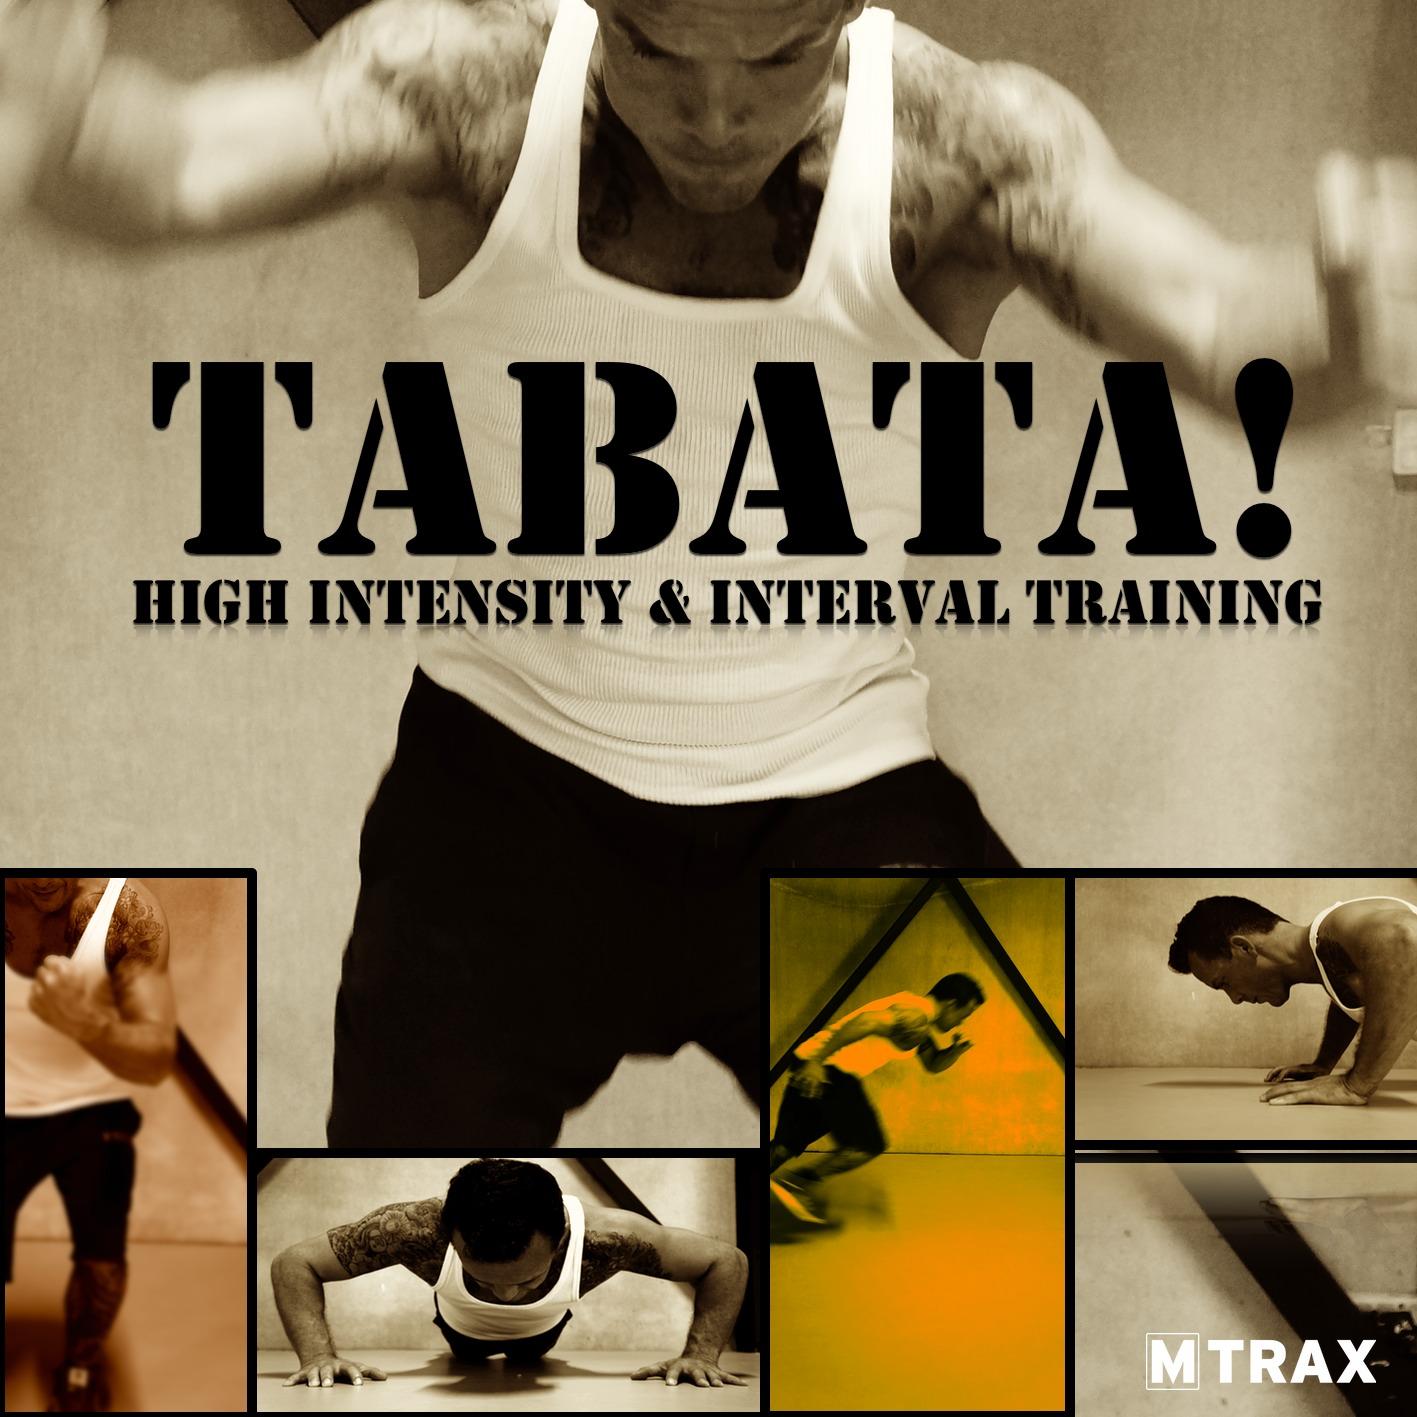 Tabata High Intensity Interval Training Mtrax Fitness